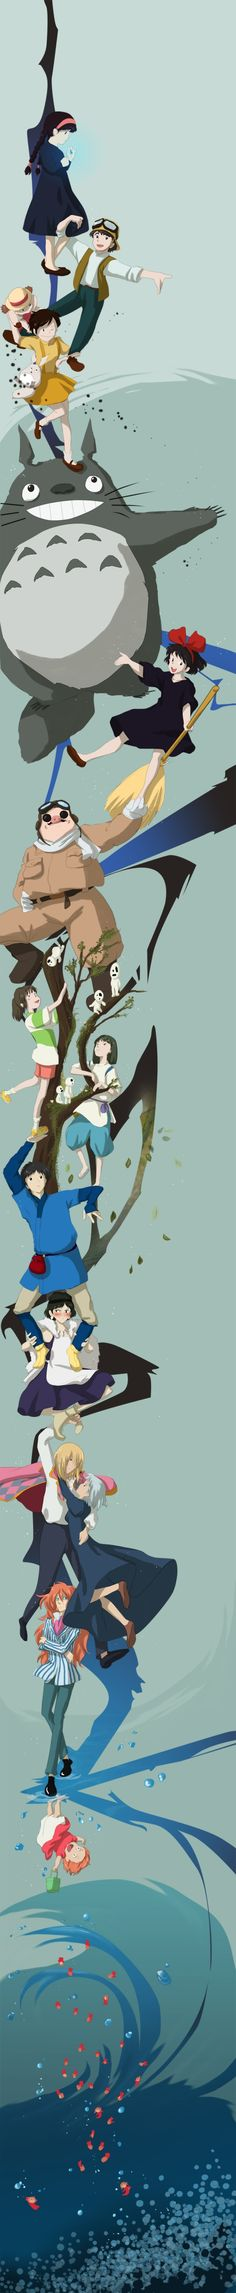 Miyazaki is the greatest :D